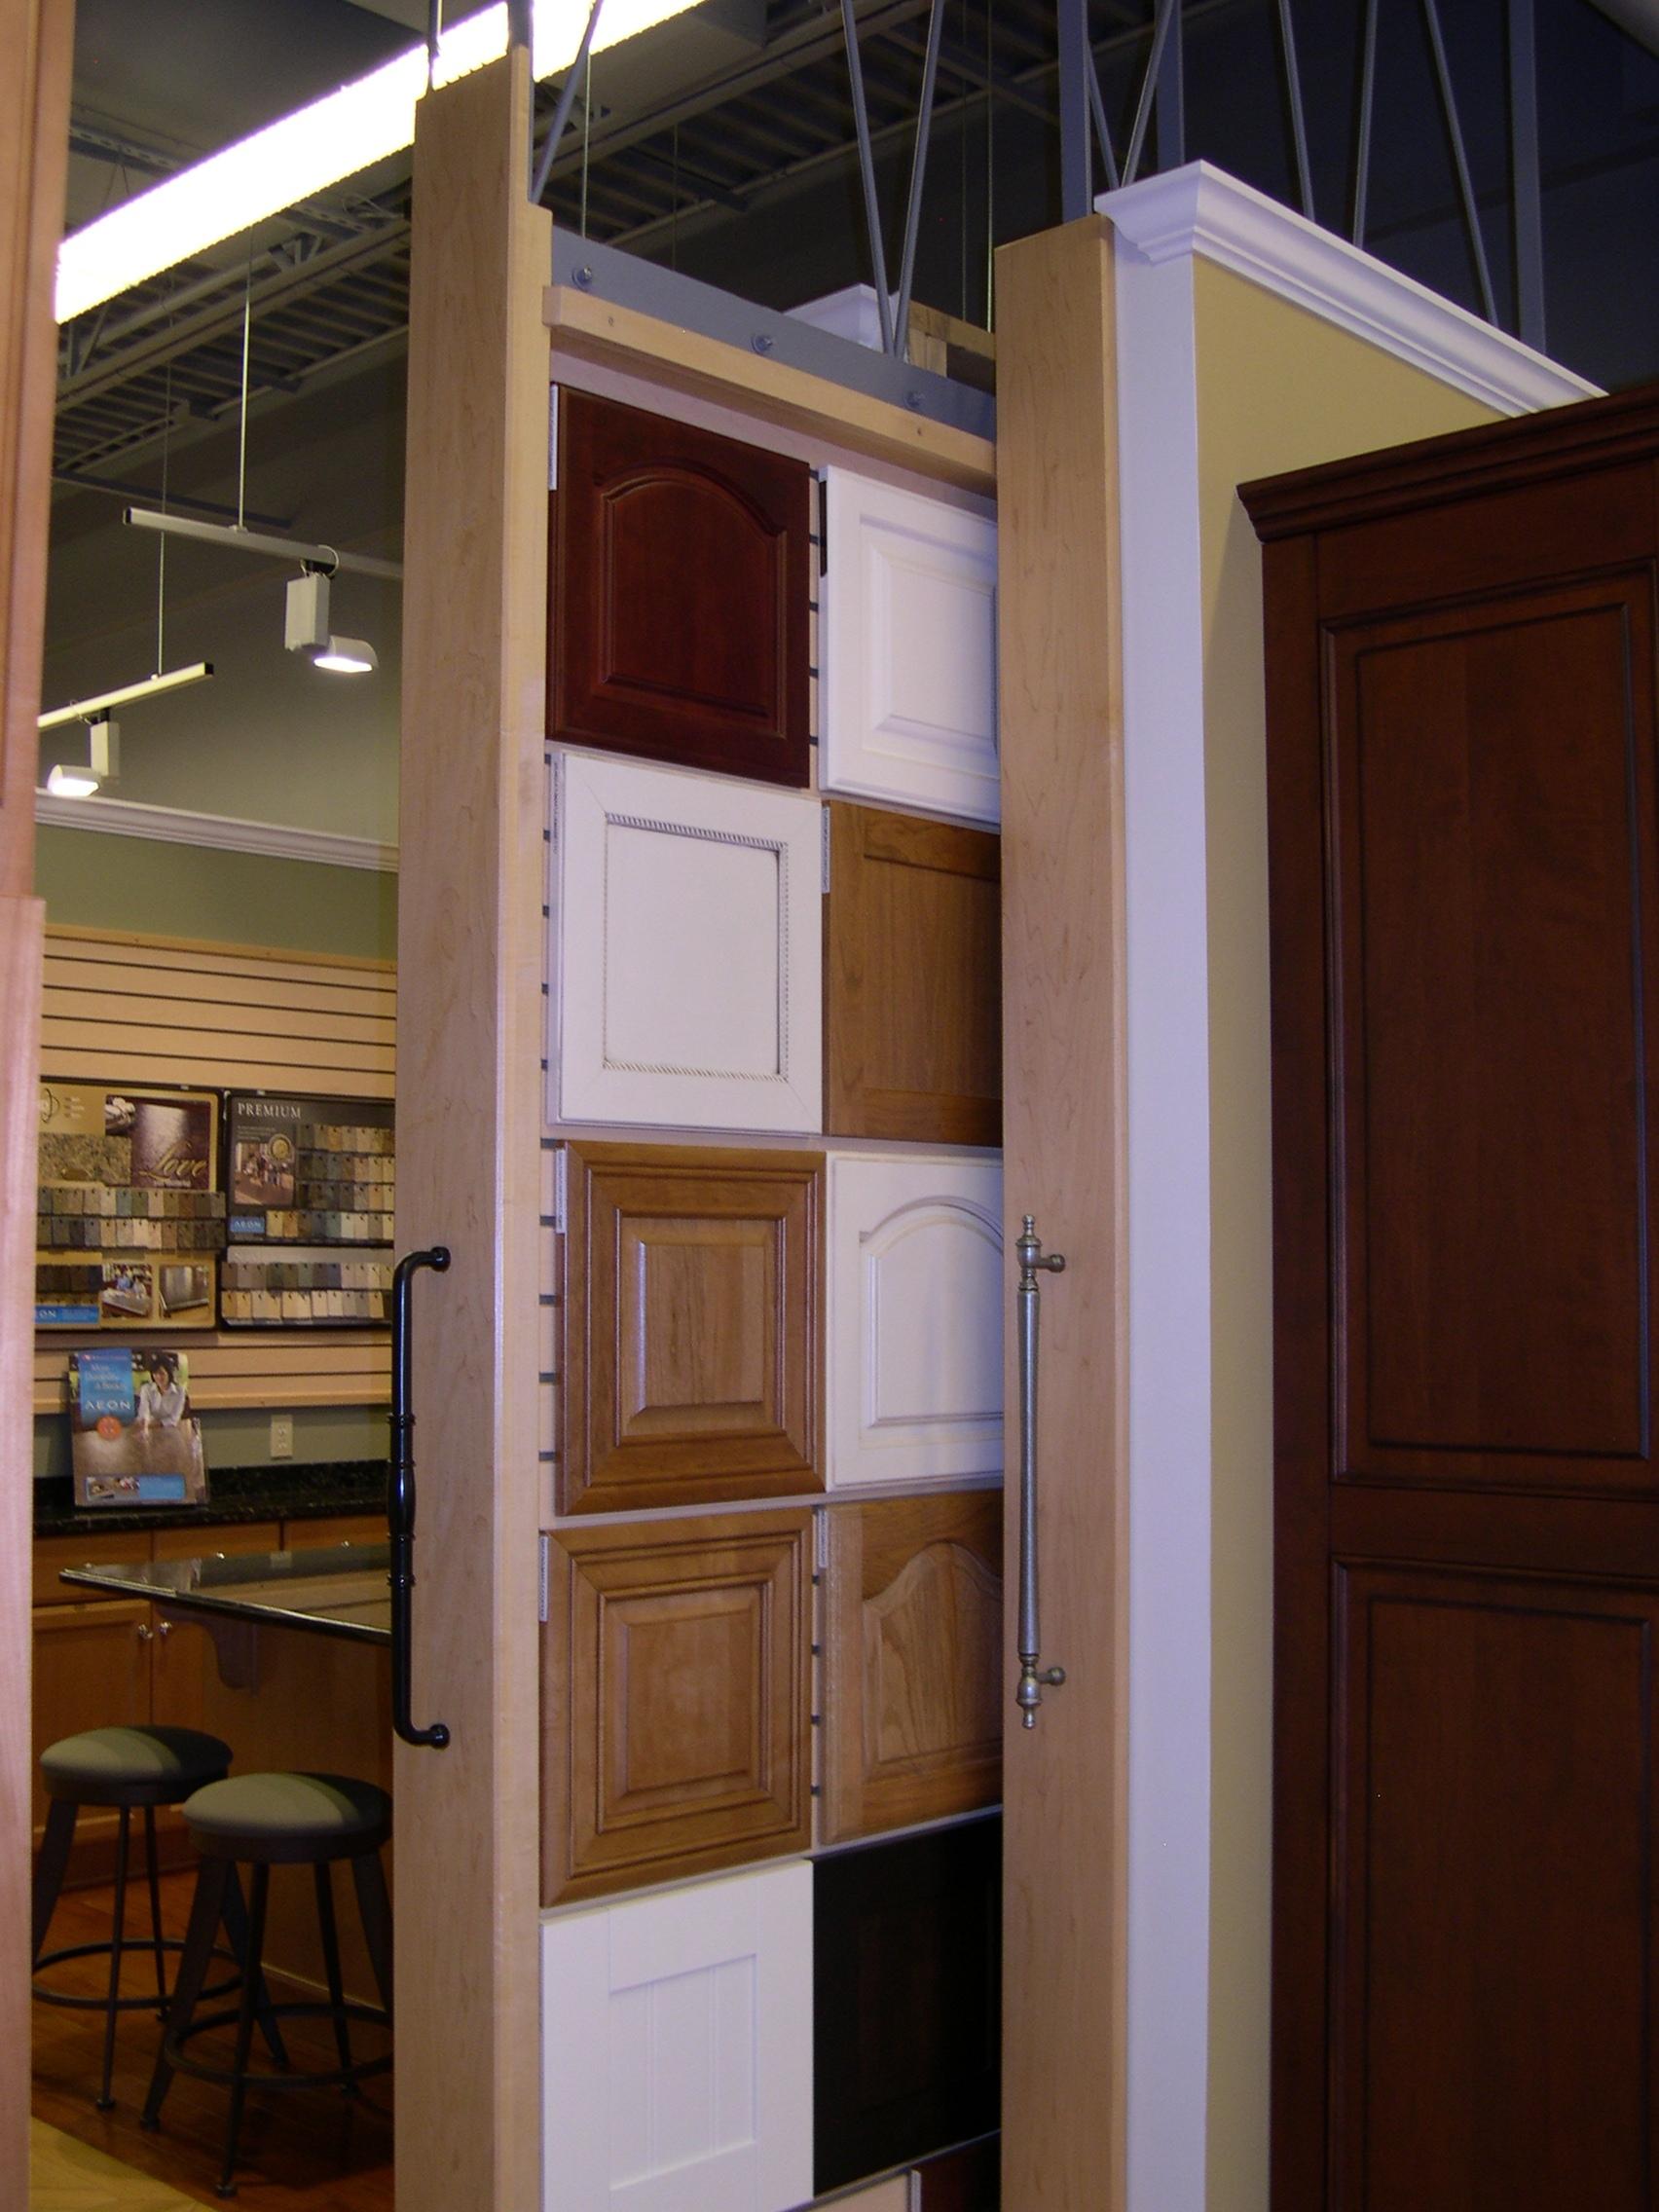 my showroom: jackson kitchen designs | prosales online | showrooms